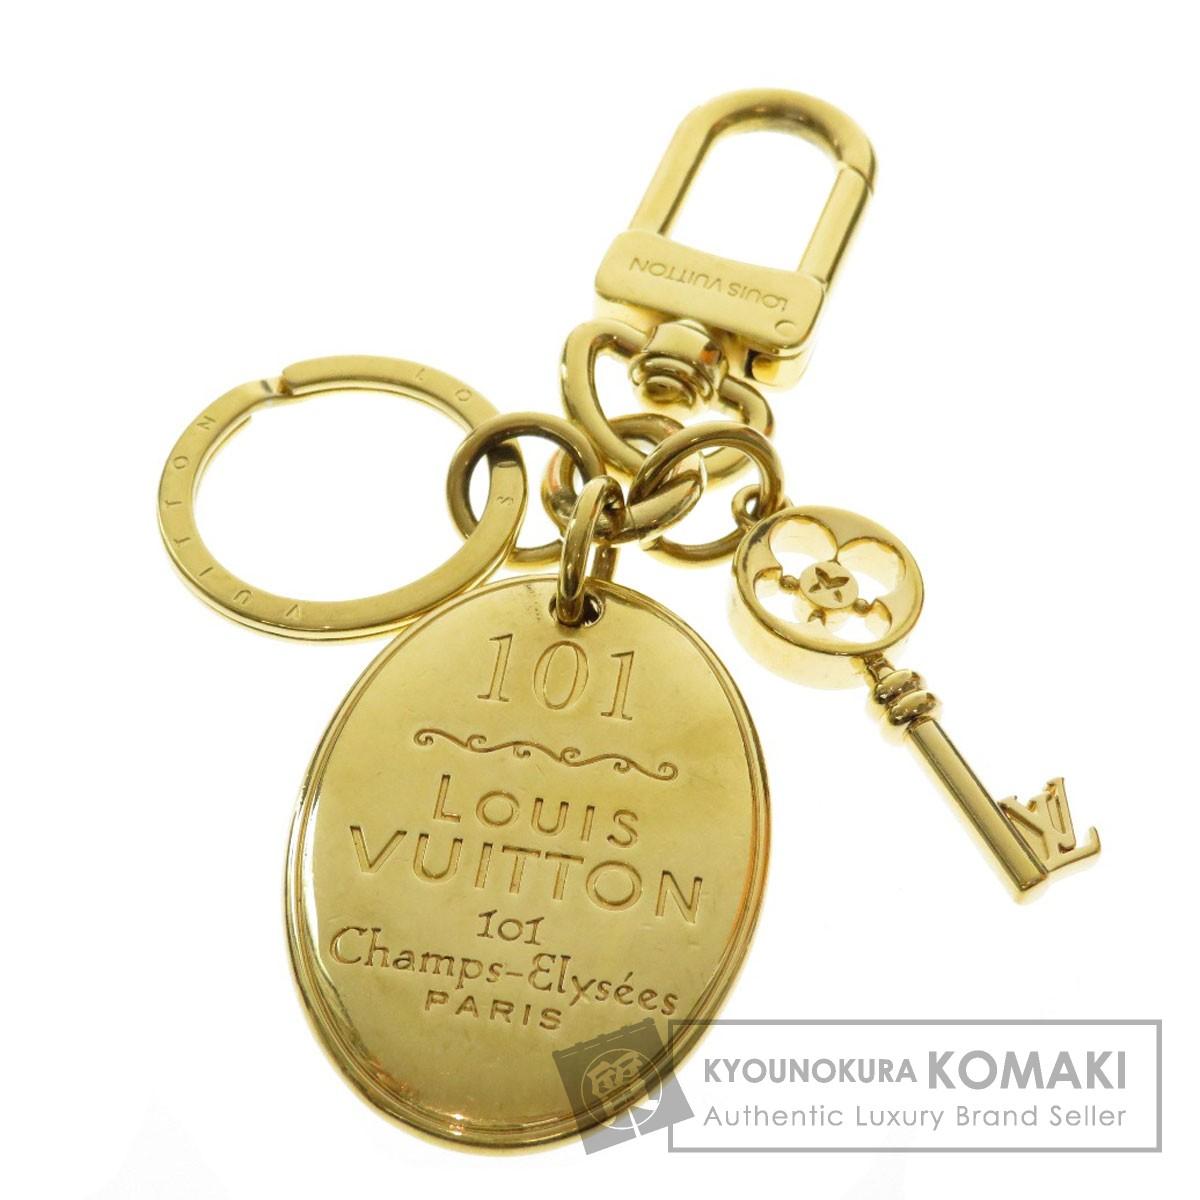 LOUIS VUITTON ロゴモチーフ キーホルダー 金属製 ユニセックス 【中古】【ルイ・ヴィトン】